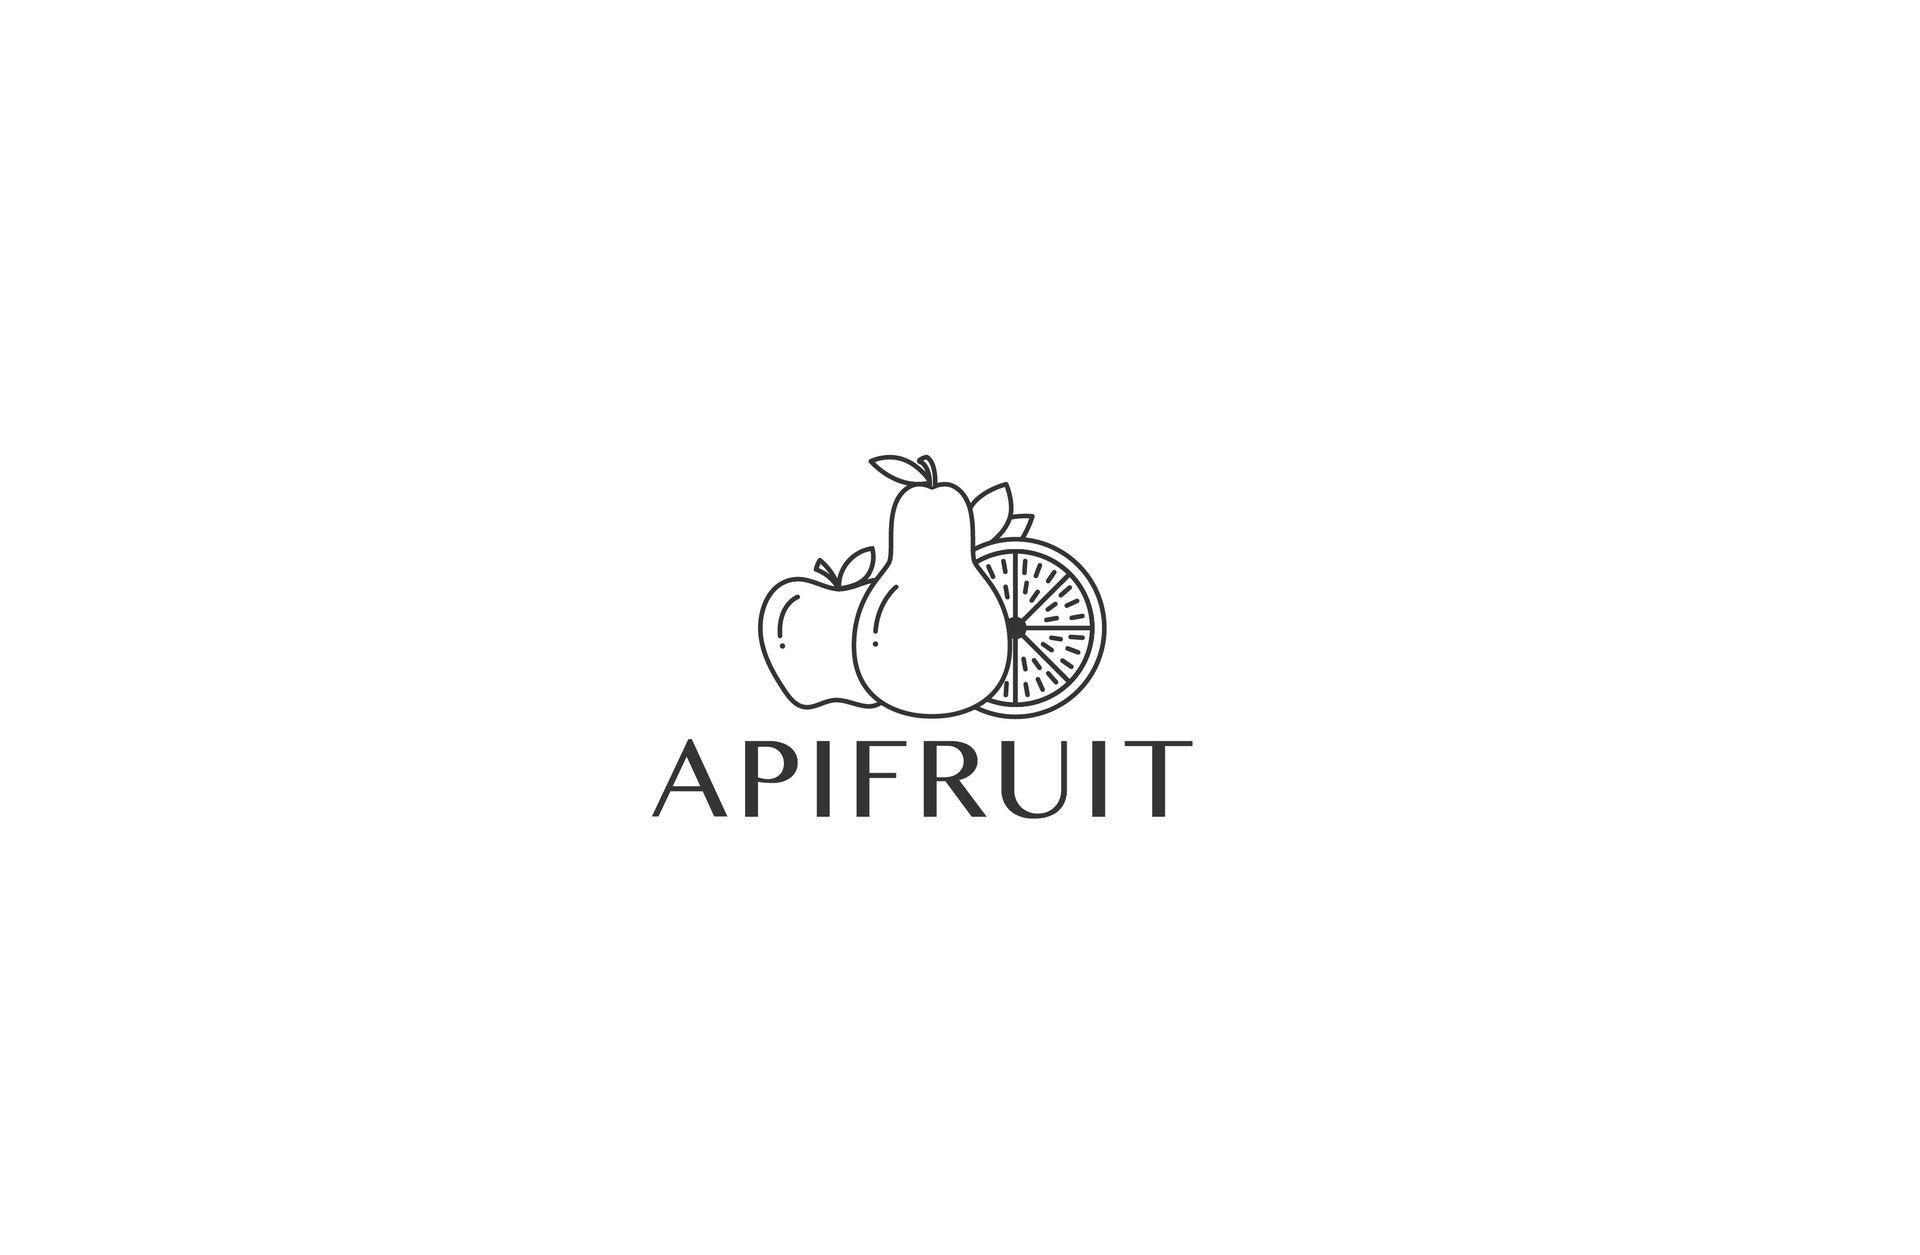 Projets site Appifruit Logo 2.jpg